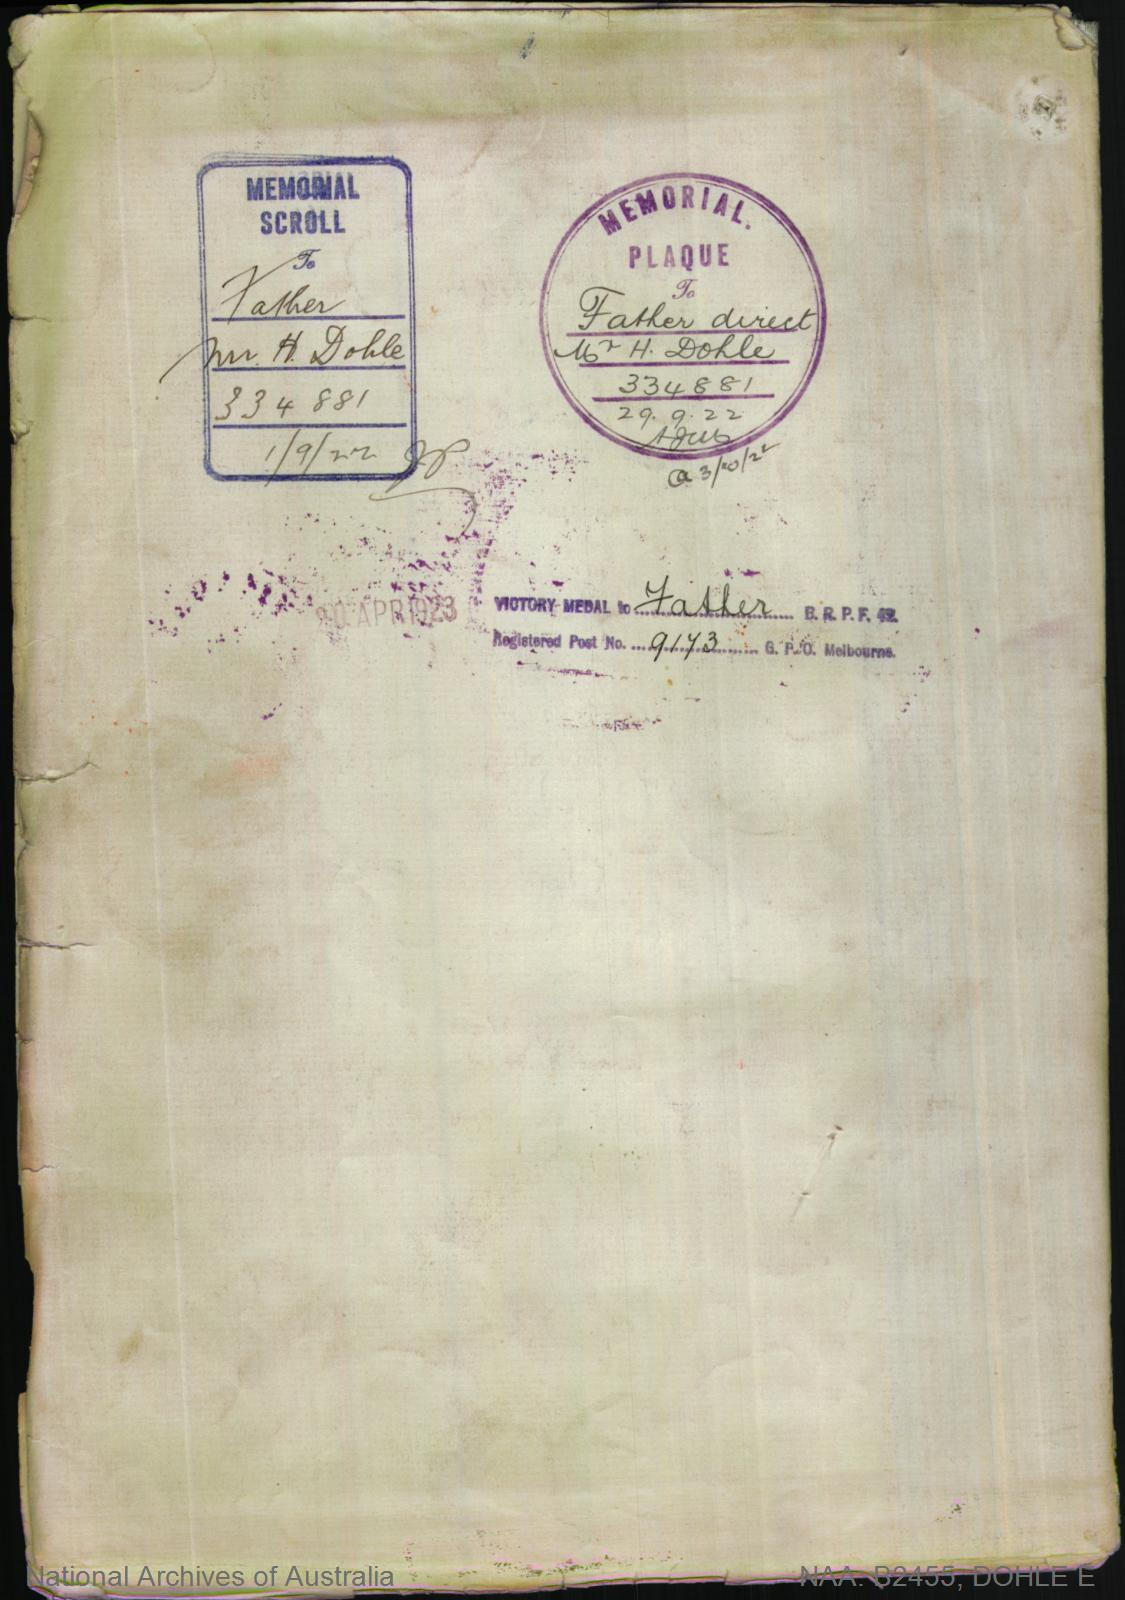 Dohle Edmund : SERN 2792 : POB Tahara VIC : POE Melbourne VIC : NOK F Dohle Hermann